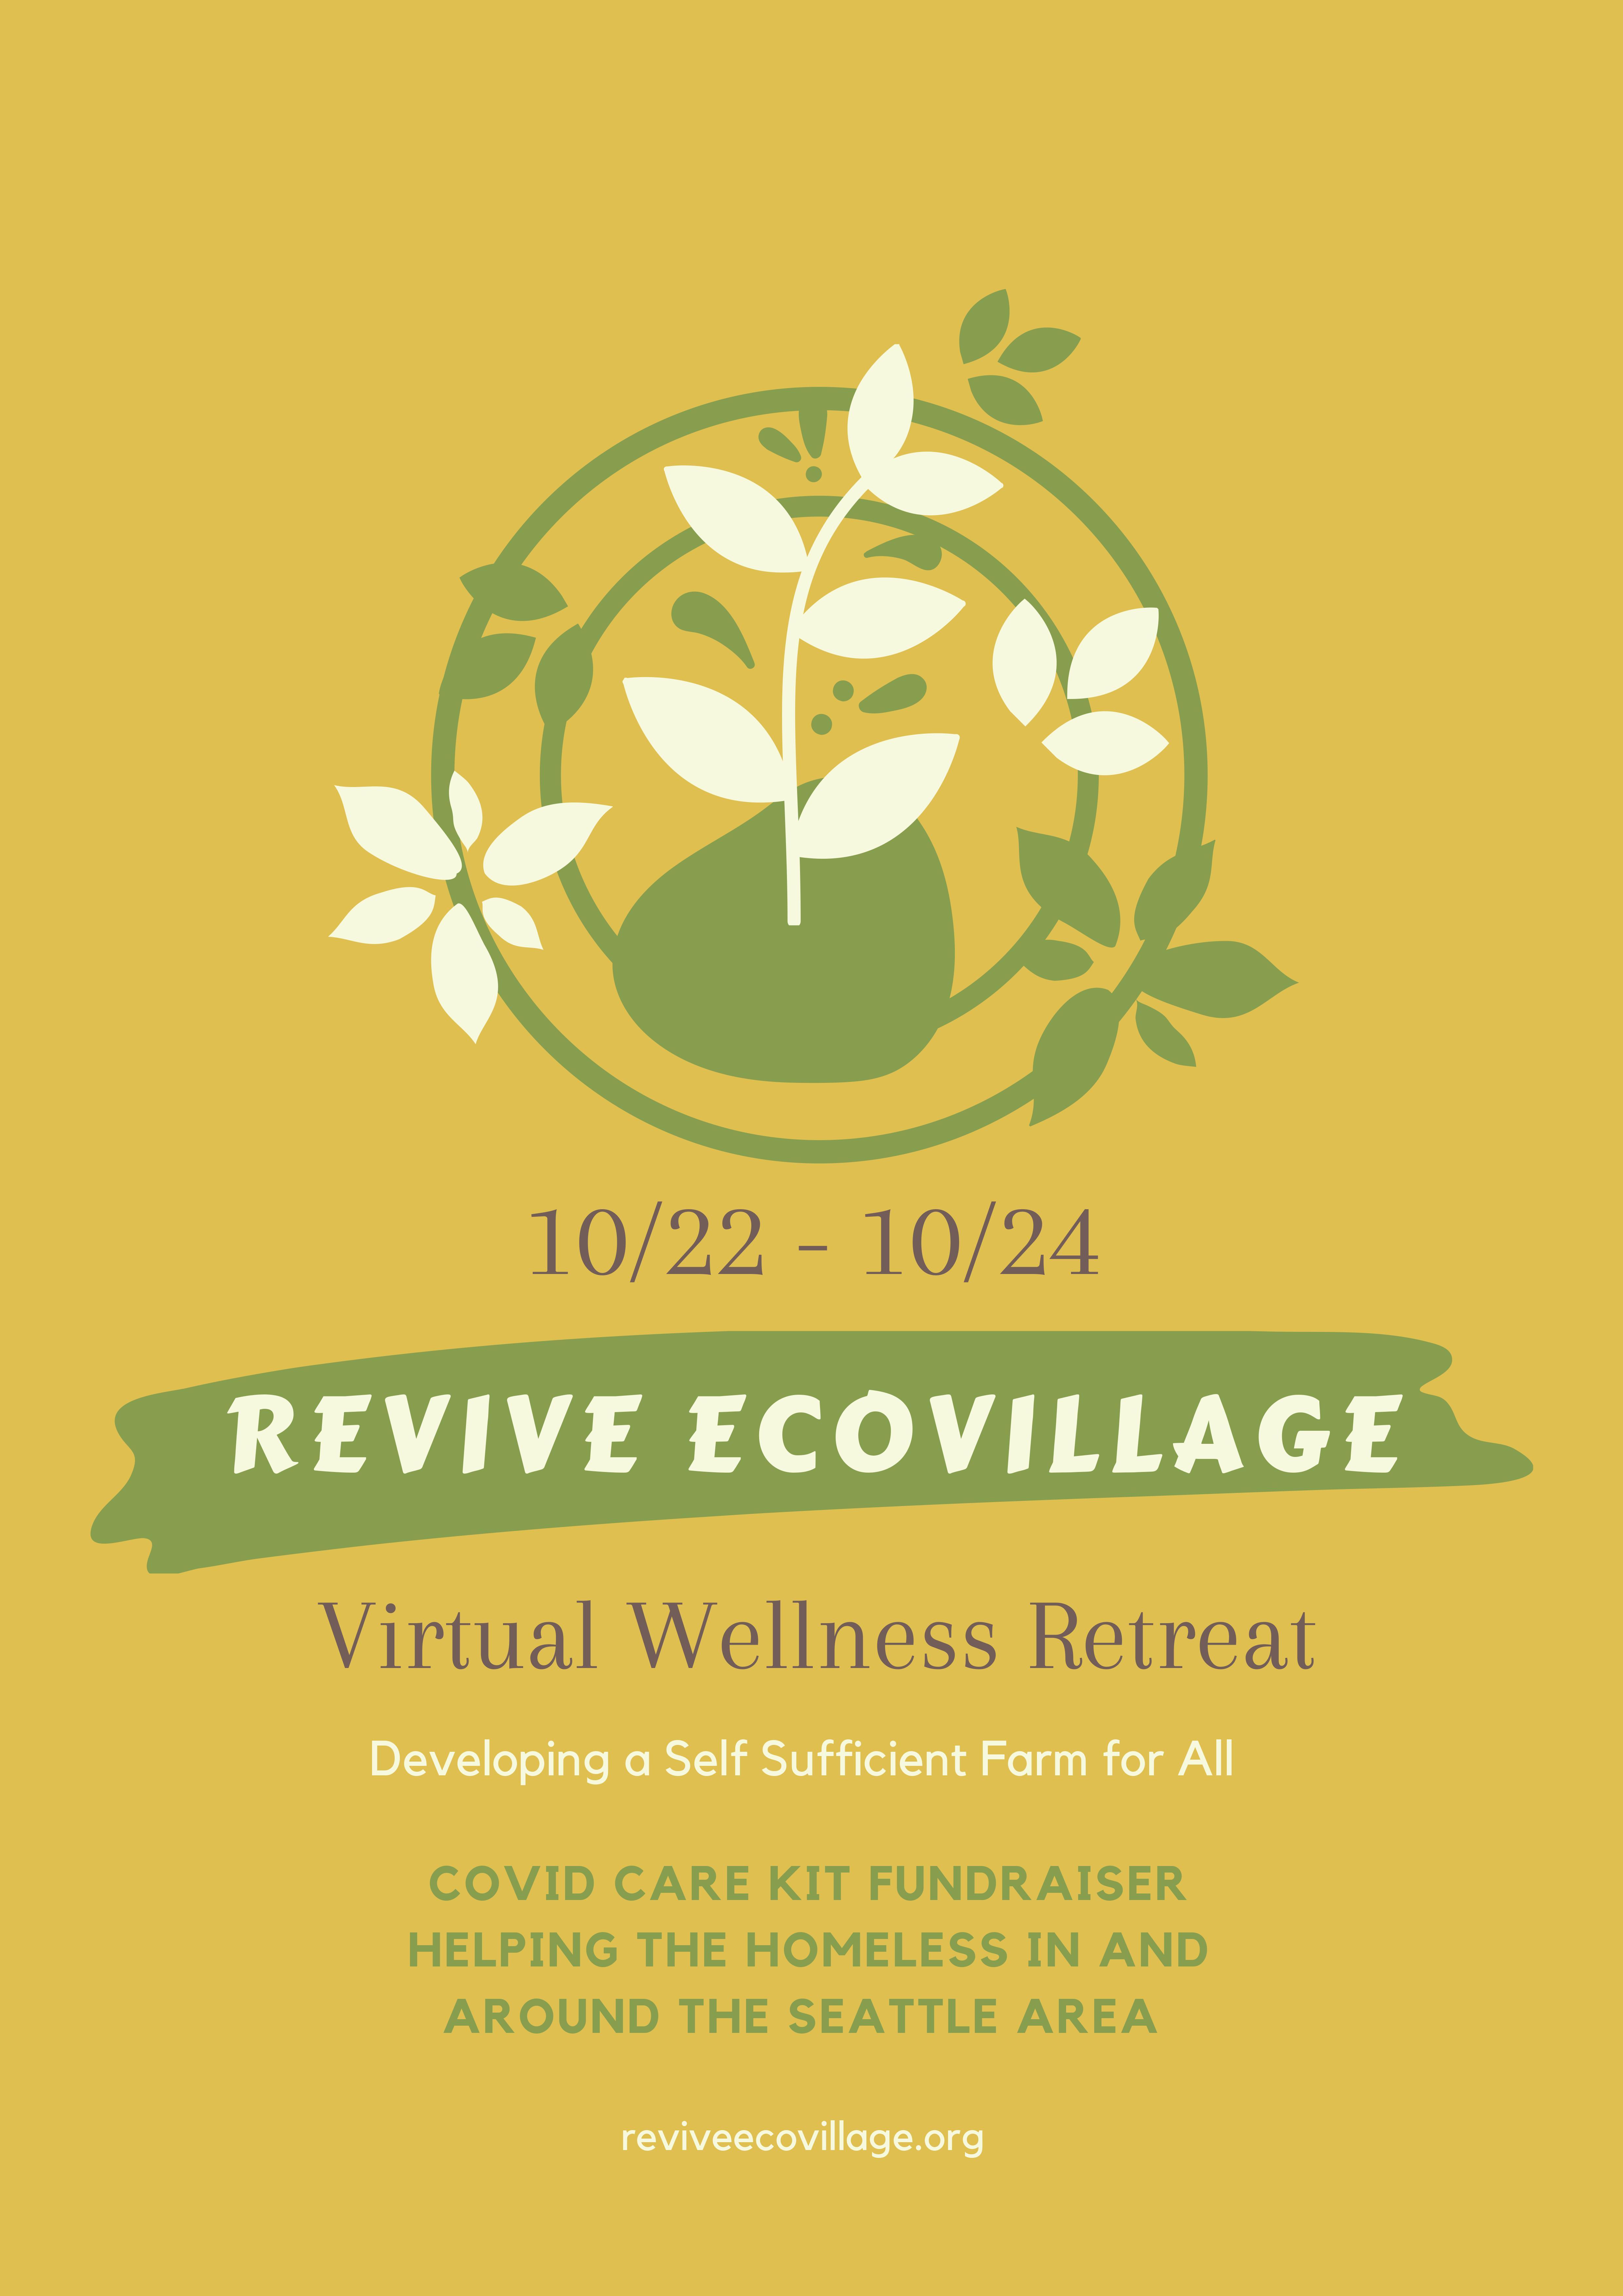 virtual-wellness-retreat-fundraiser-revive-ecovillage-2021-2